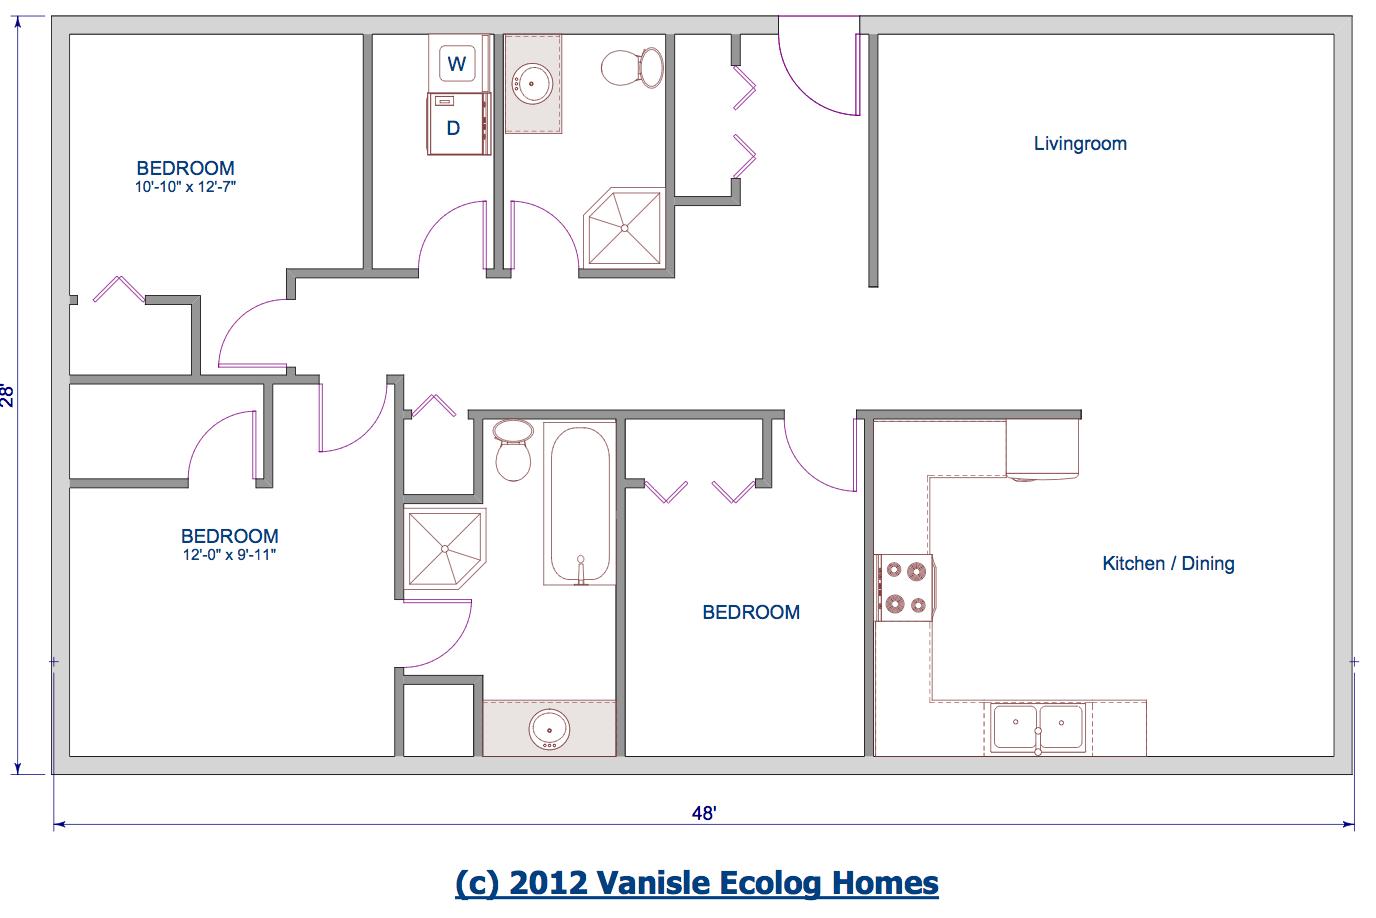 Floor Plan 1344 Sqft 28 X48 Open Concept House Plans Cabin Floor Plans Bungalow Floor Plans